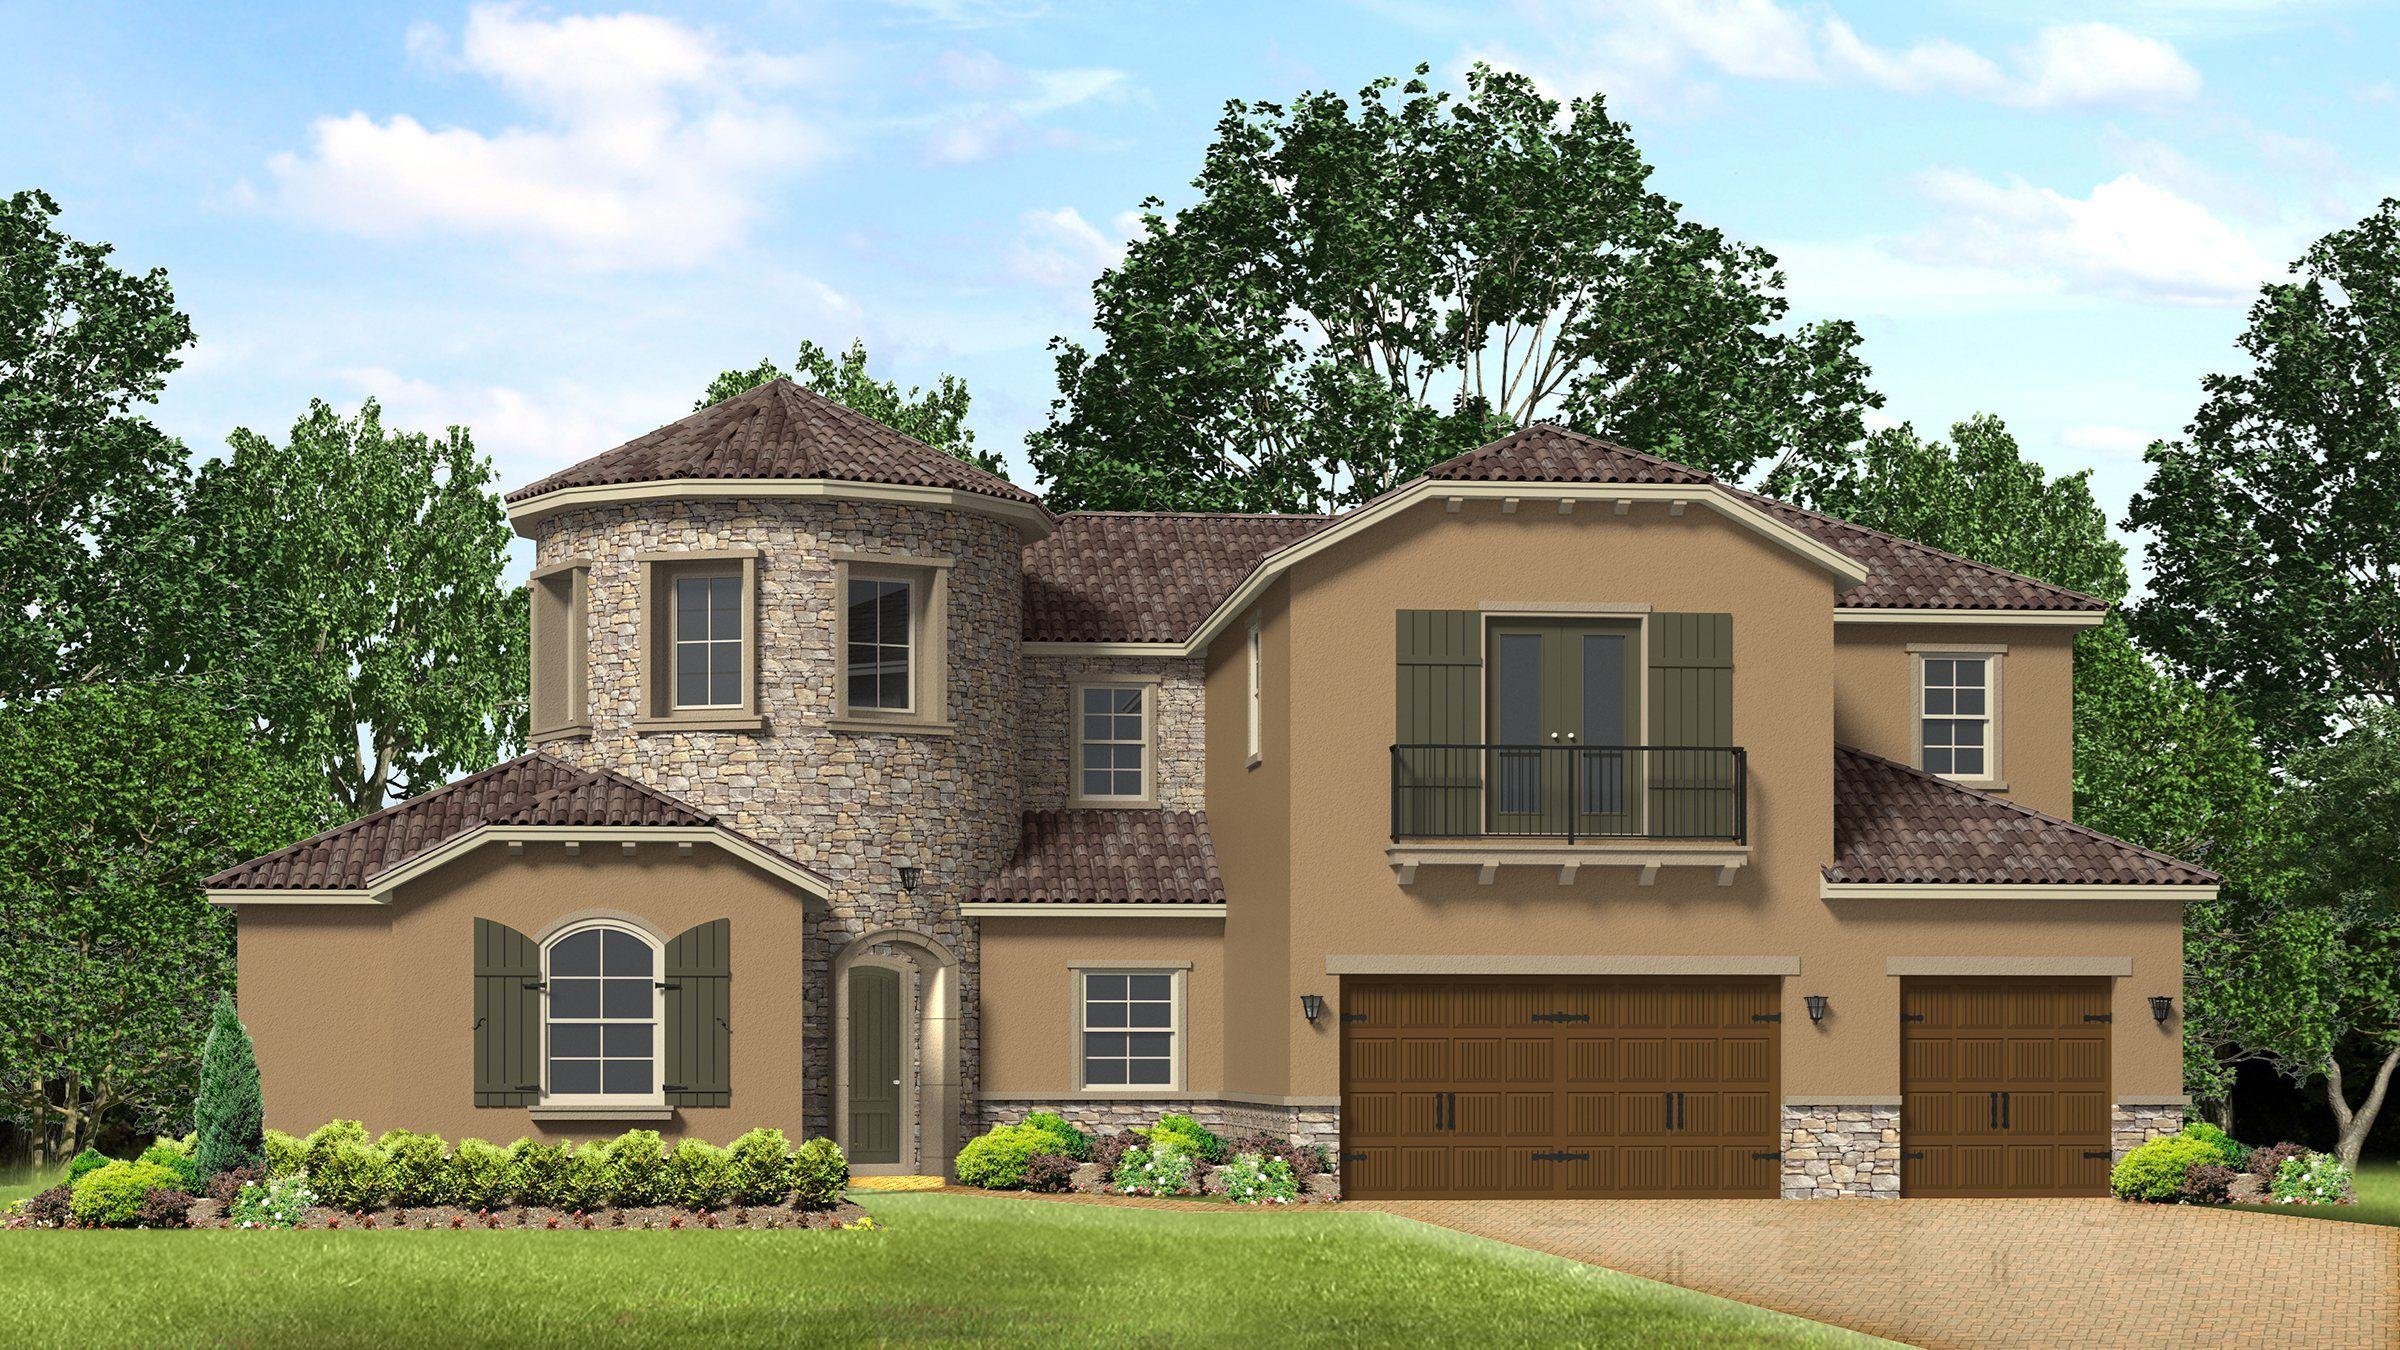 Single Family for Active at Sterling 98 Sitara Lane St. Johns, Florida 32259 United States